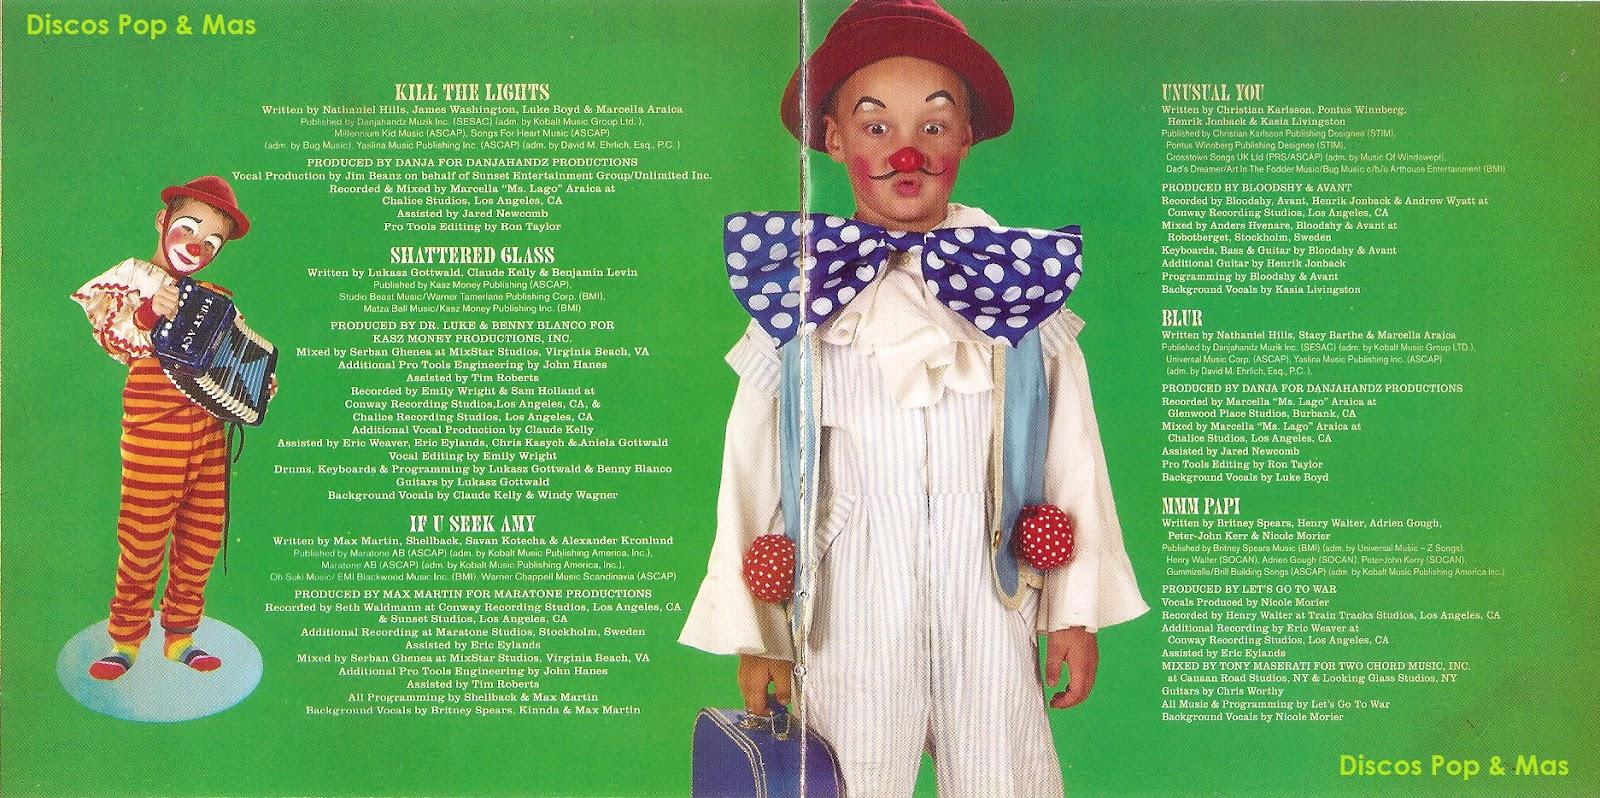 Discos Pop Mas Britney Spears Circus Deluxe EditionBritney Spears Circus Deluxe Edition